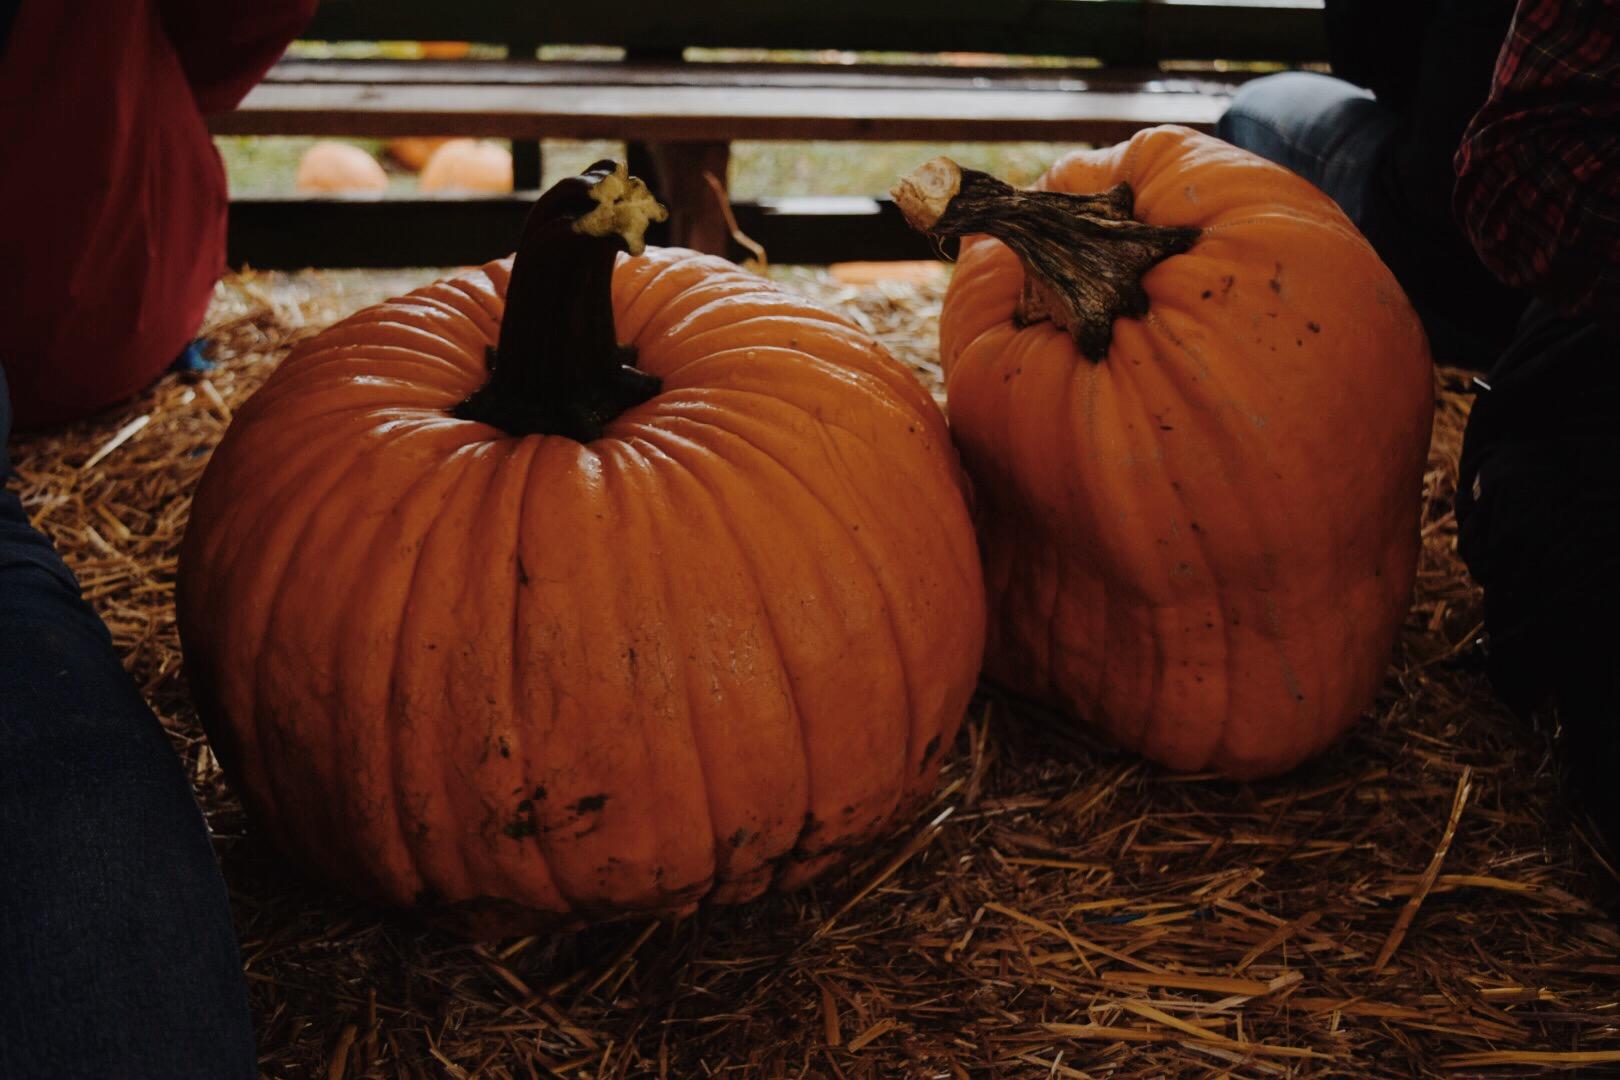 Pumpkin Patch | Hay Ride | Pumpkin Spice Latte Waffles